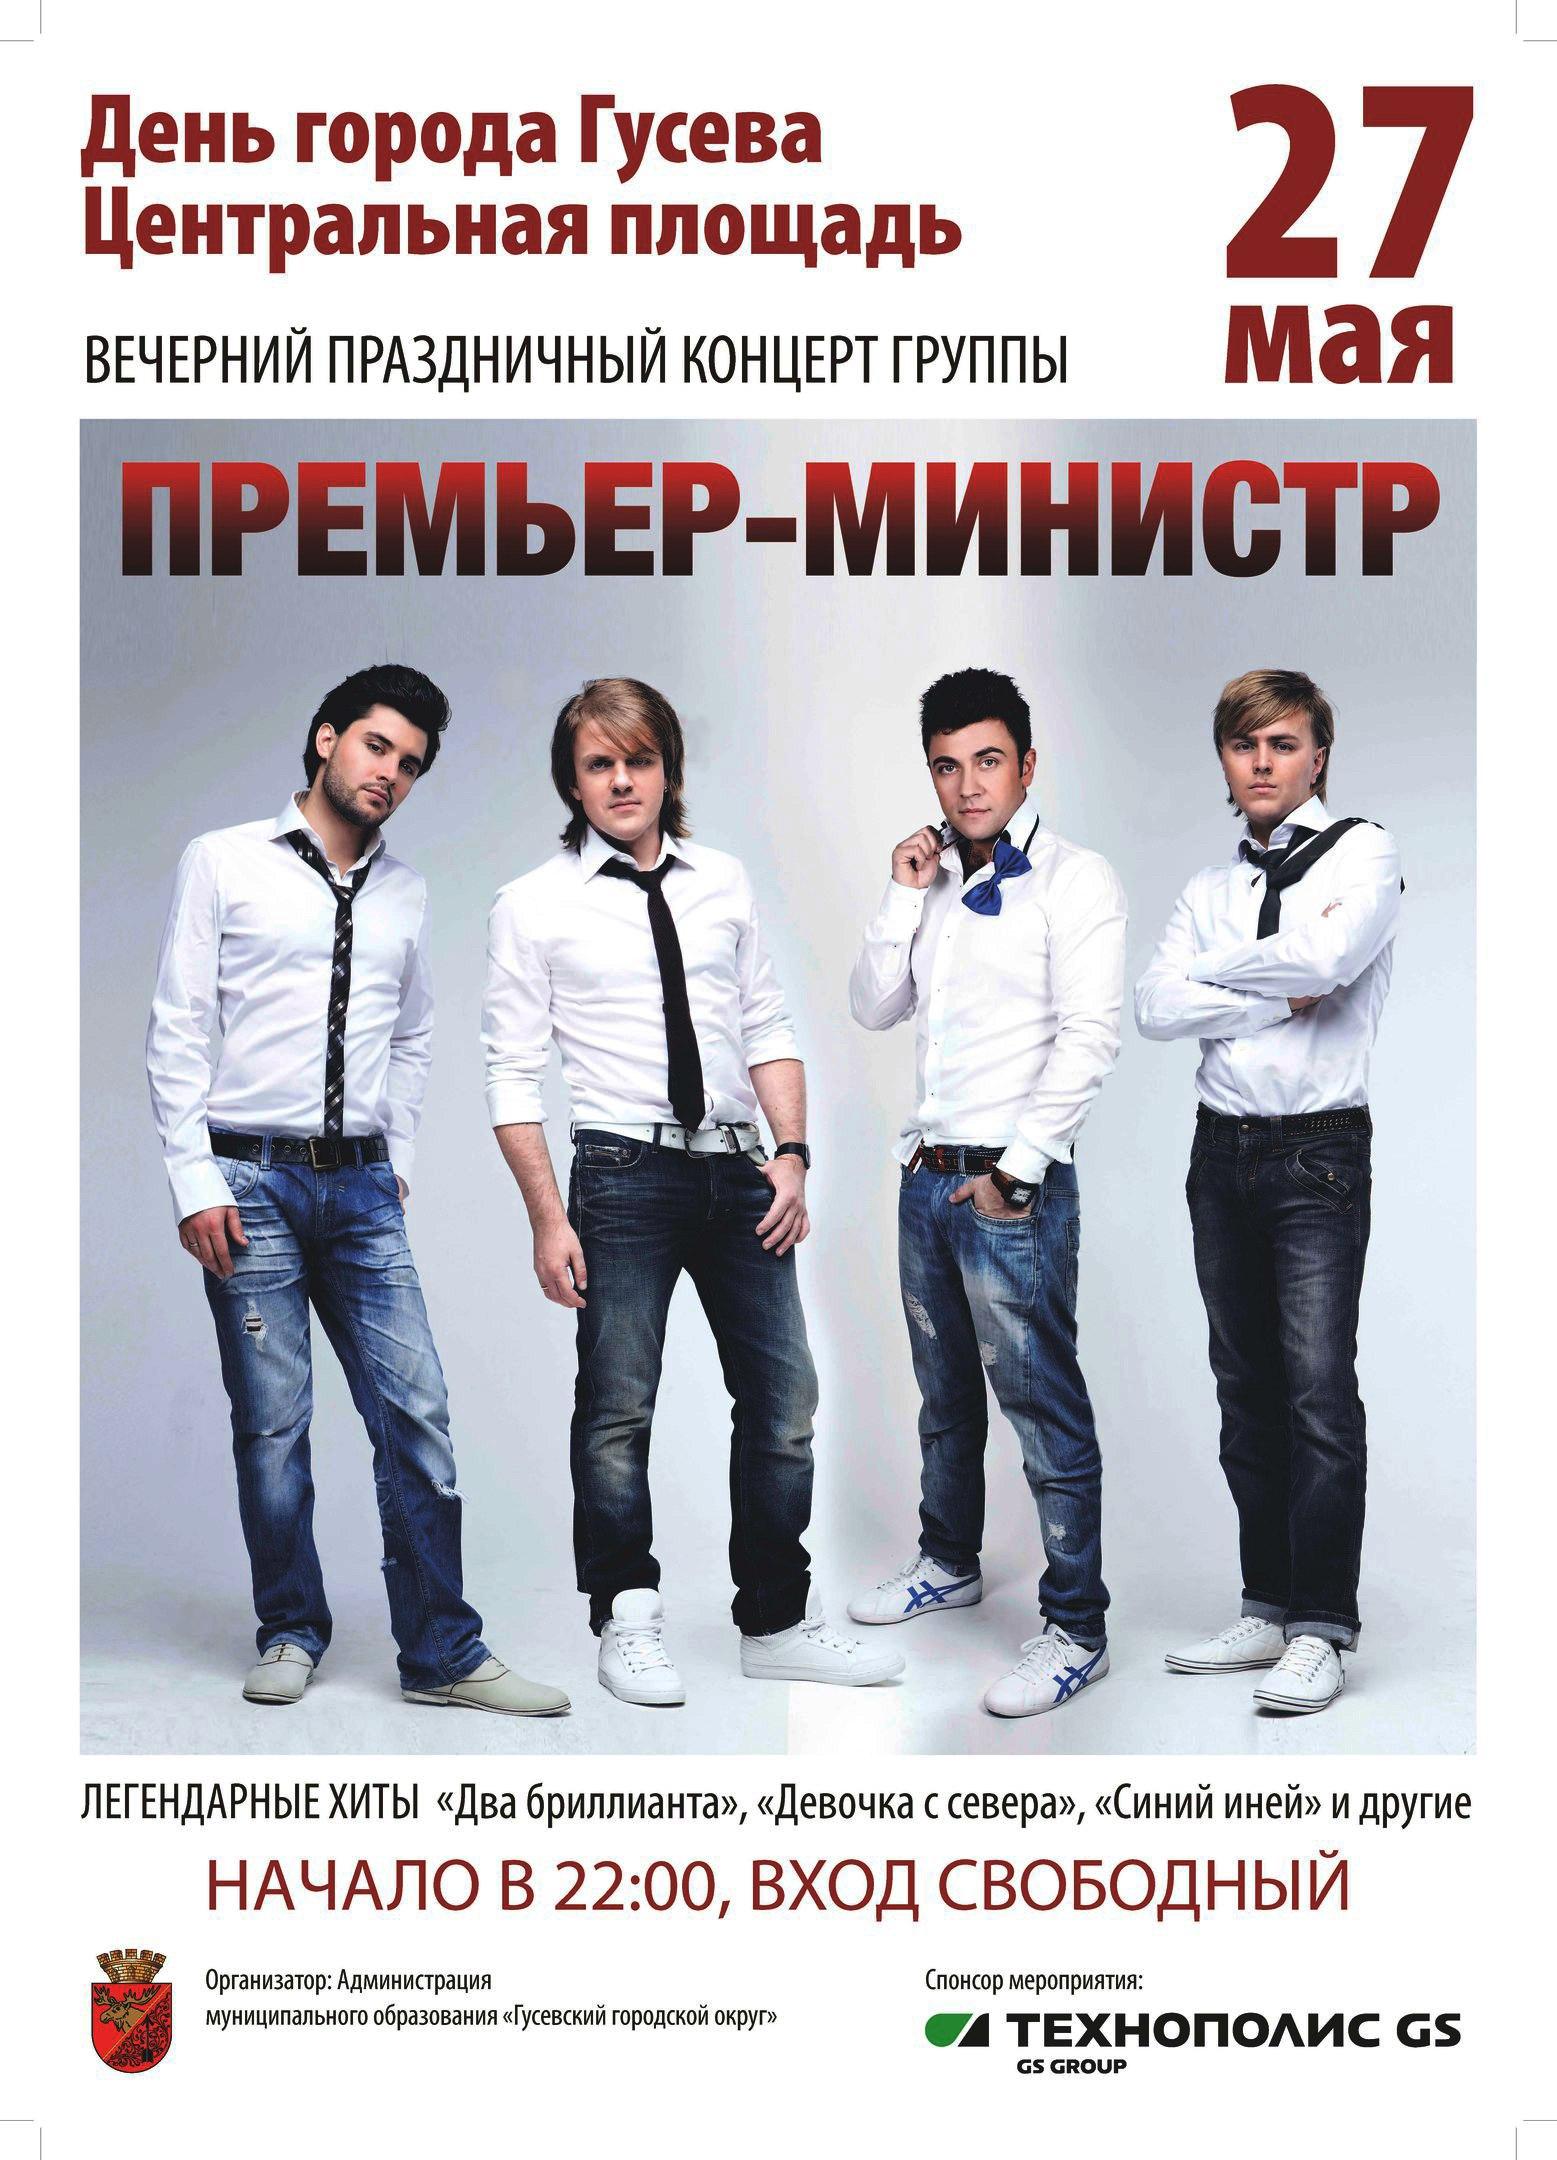 YvuQVvzL6Lc.jpg